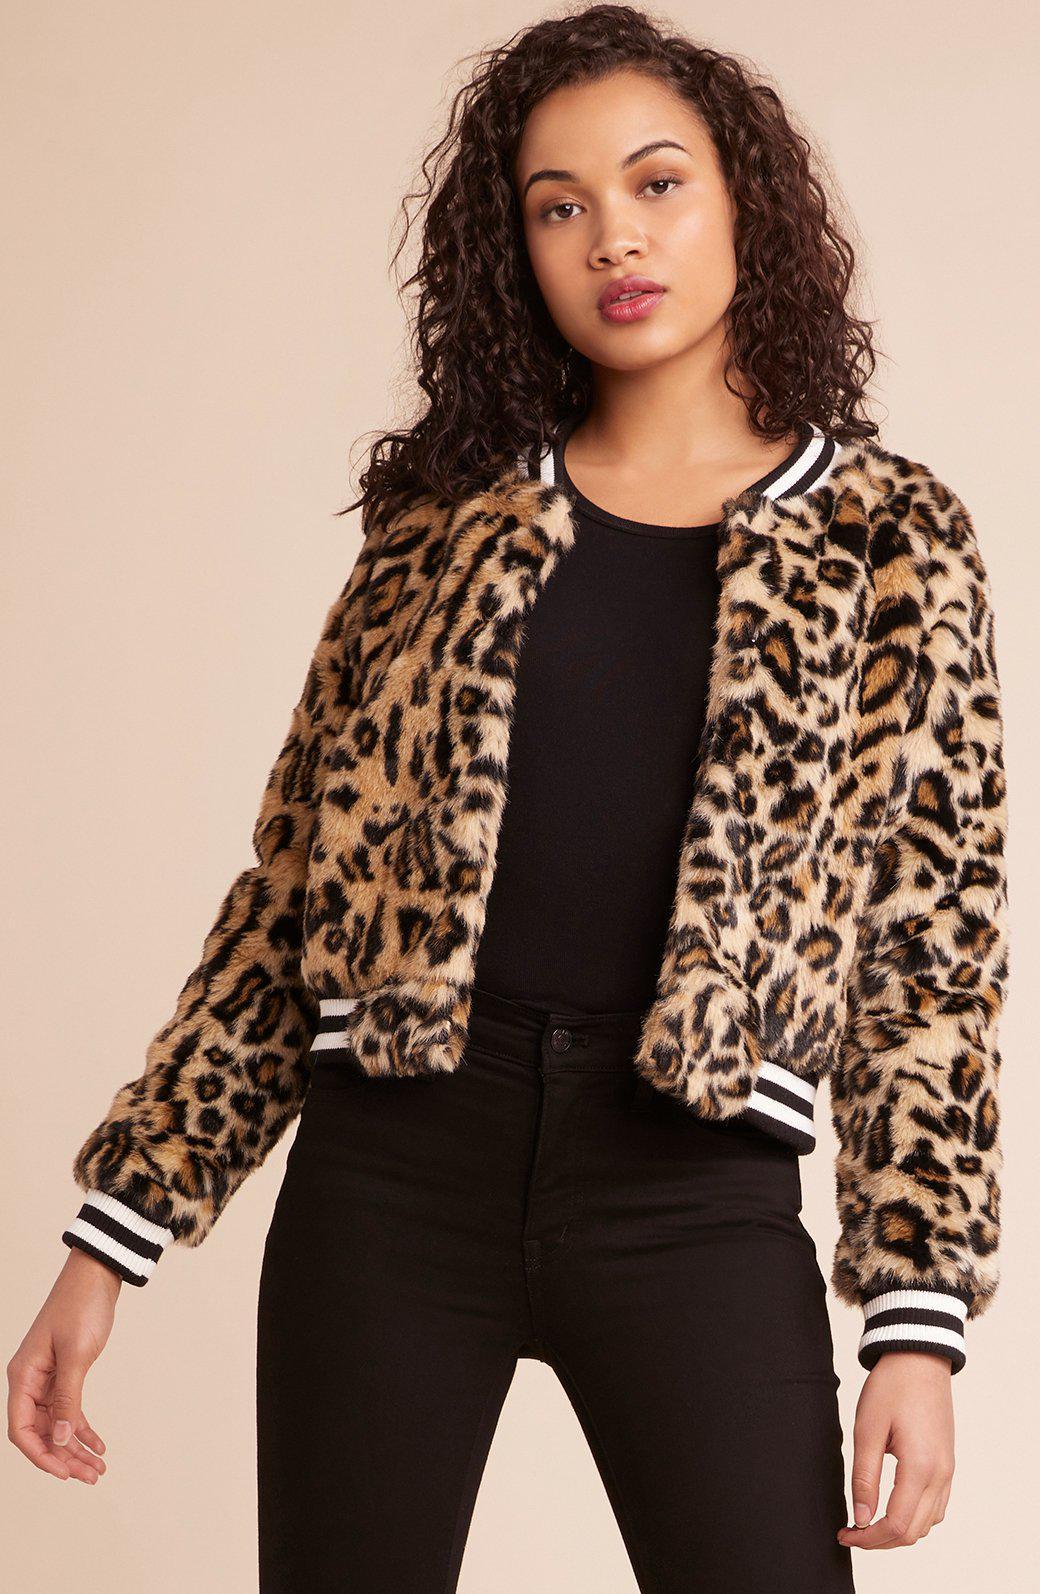 1e7205530f41 Jack BB Dakota Clever Girl Leopard Print Faux Fur Bomber Jacket in ...